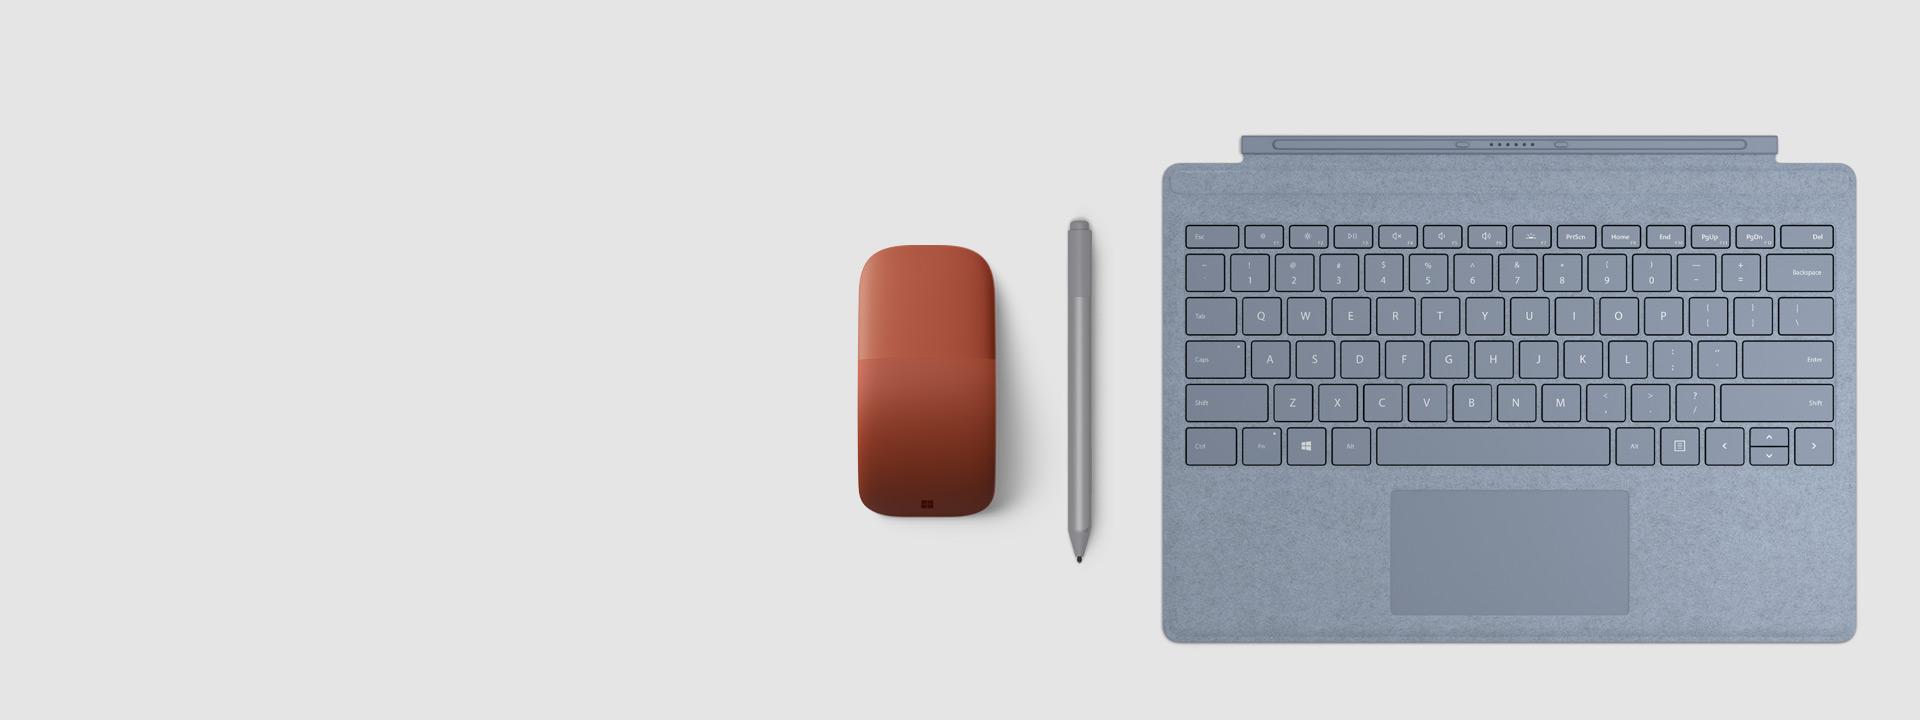 Surface ペン、Surface Signature タイプカバー、Surface アーク マウス